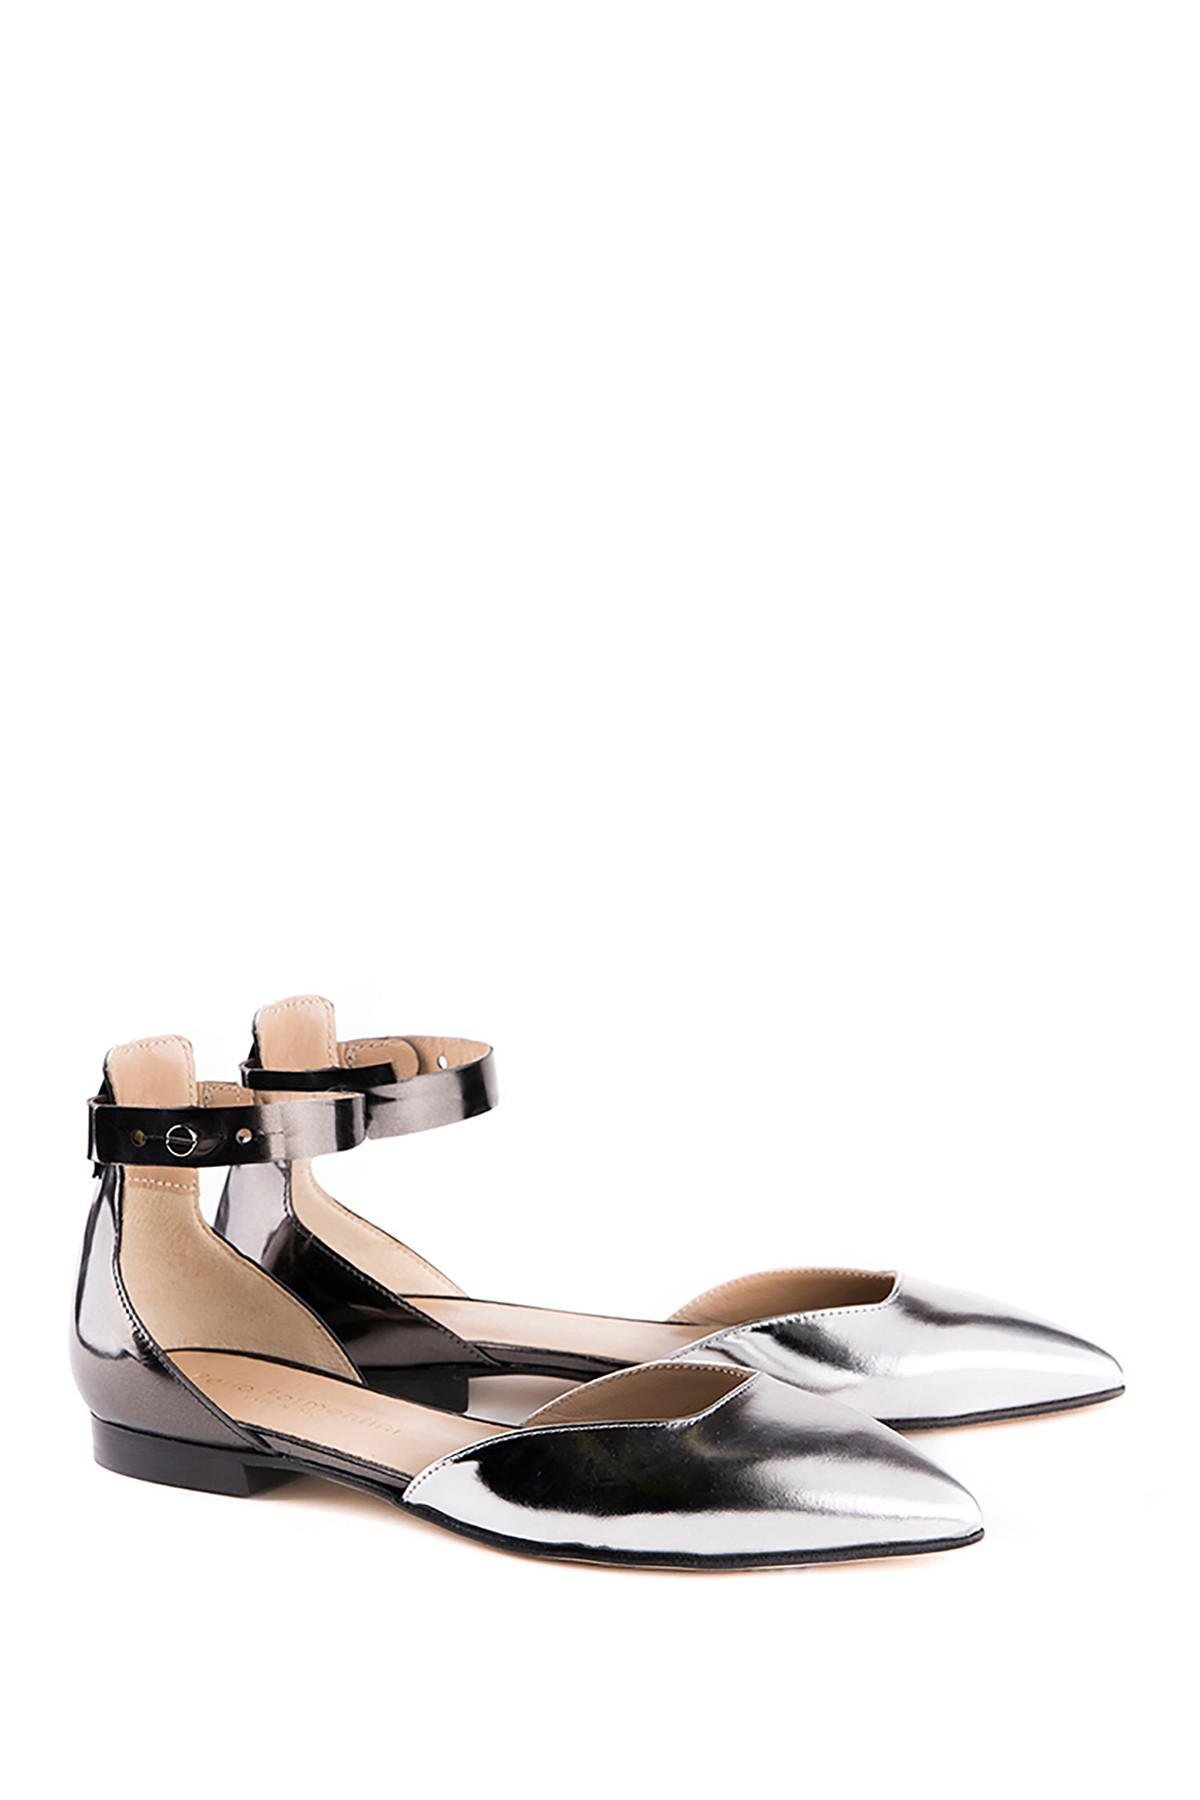 Perla Formentini Abelie Leather Flat qa7gIy